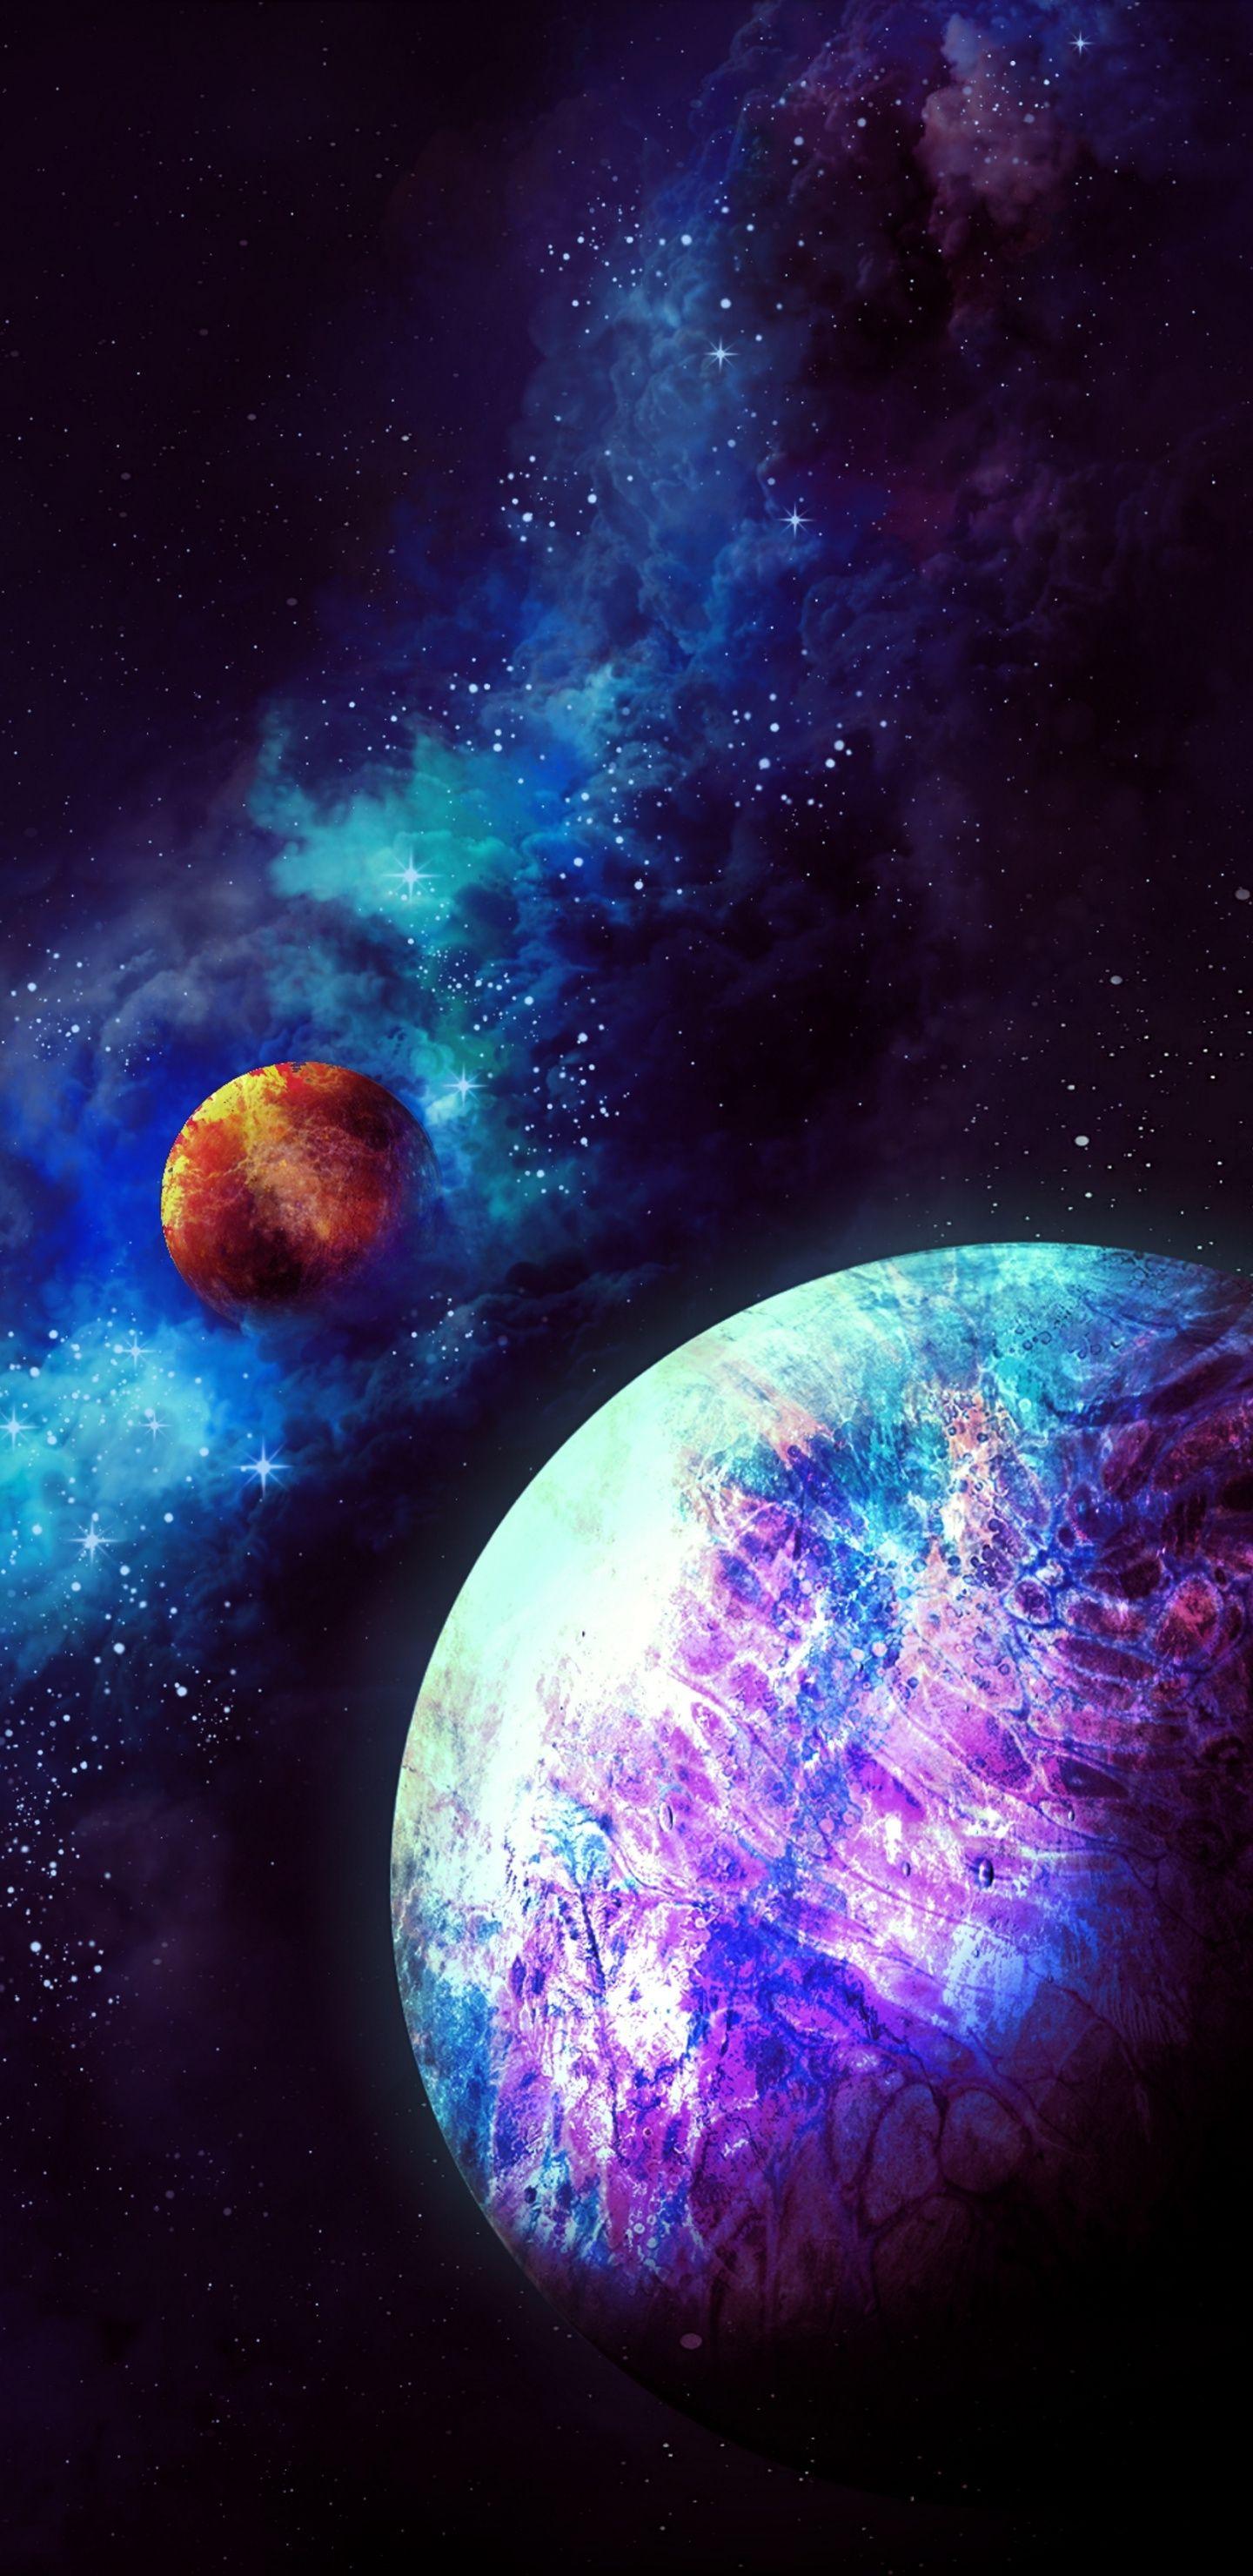 1440x2960 Planets Nebula Galaxy Wallpaper Galaxy Wallpaper Pikachu Wallpaper Dragon Pictures